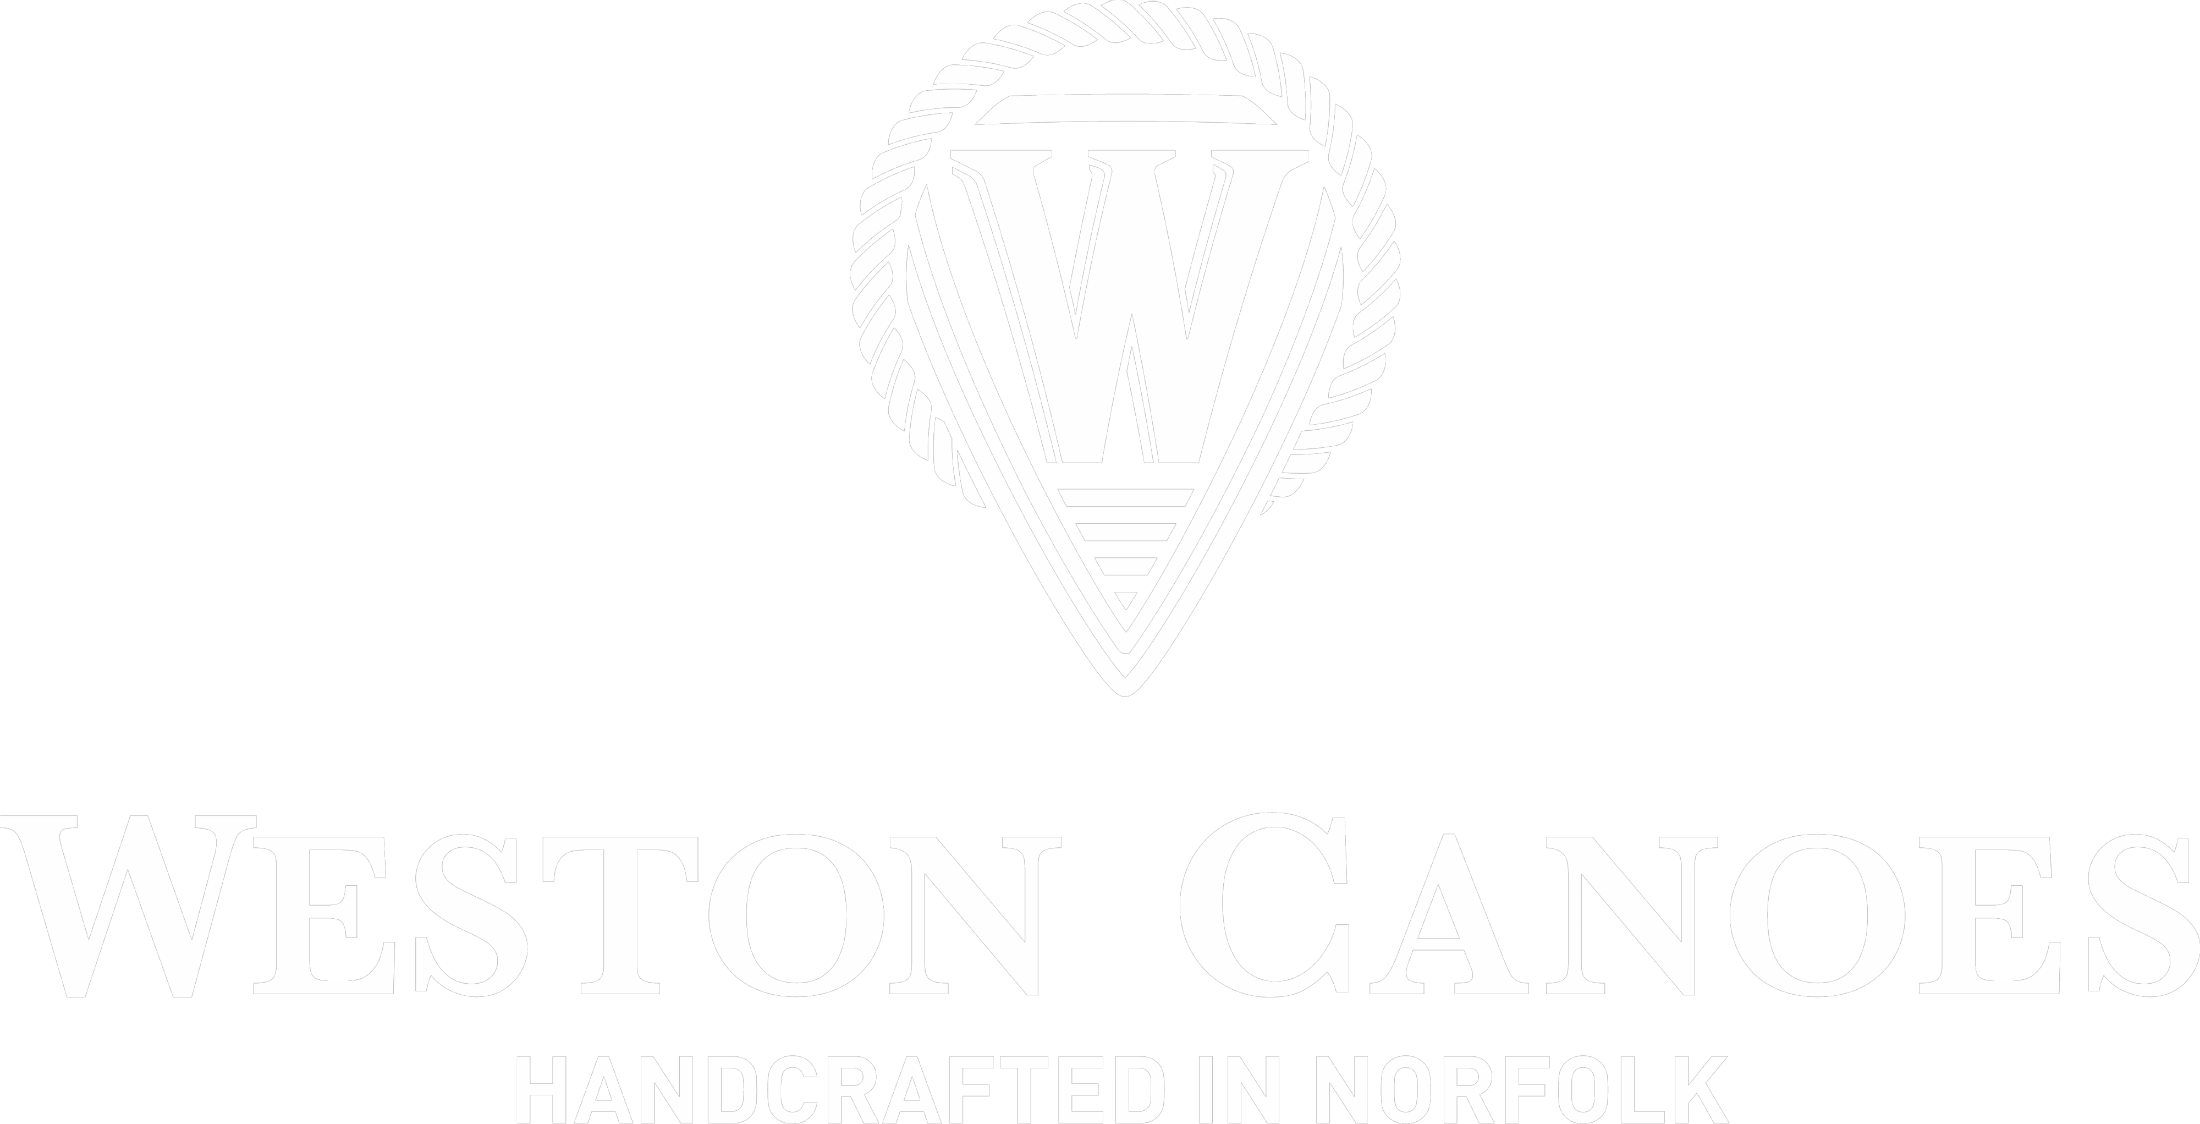 WestonCanoes-FinalLogo-whitesmaller